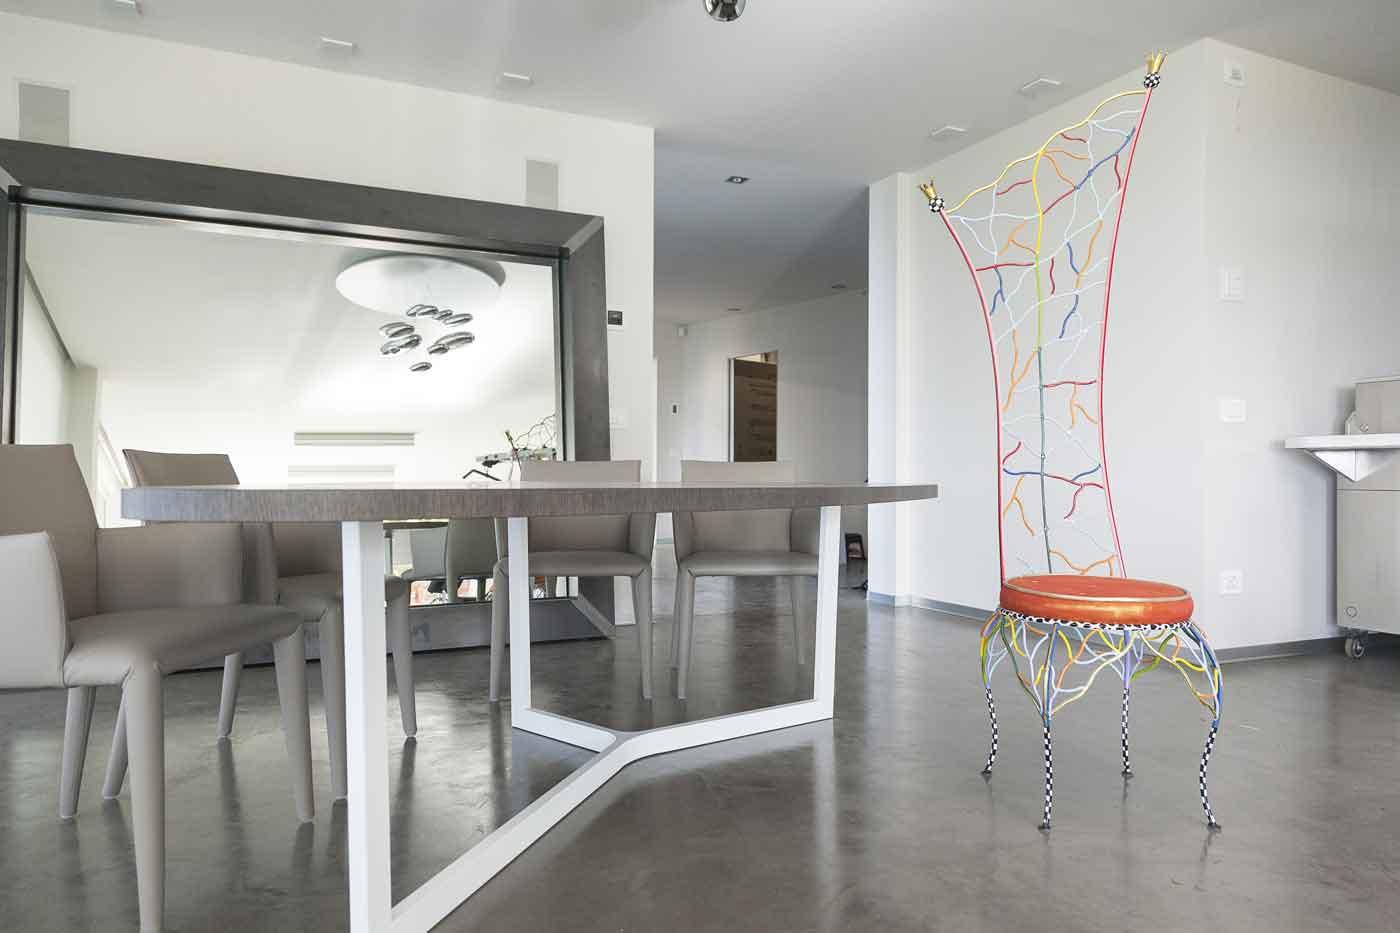 naldi-pavimenti-casa-grande-interno-soggiorno - Naldi pavimenti novara